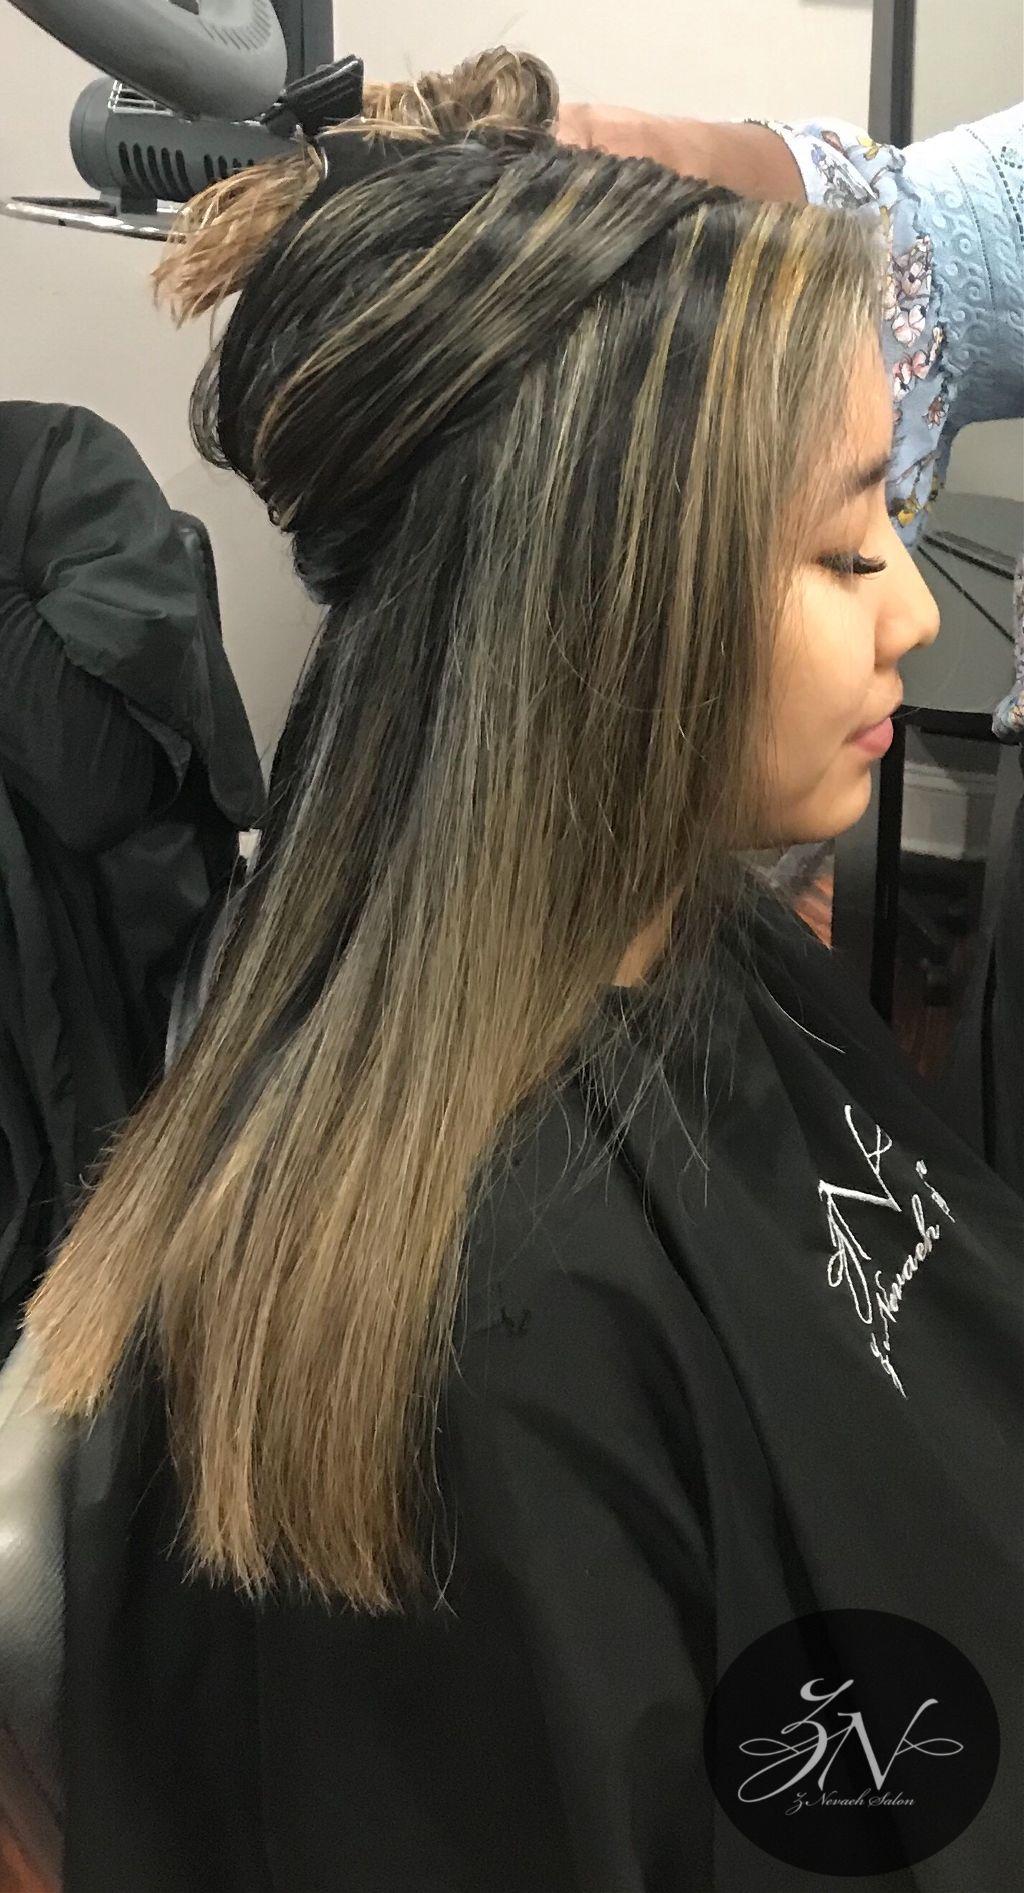 Love Is In The Hair @znevaehsalon @lezlieprice #knoxville #bestsalonknoxville #znevaehsalon